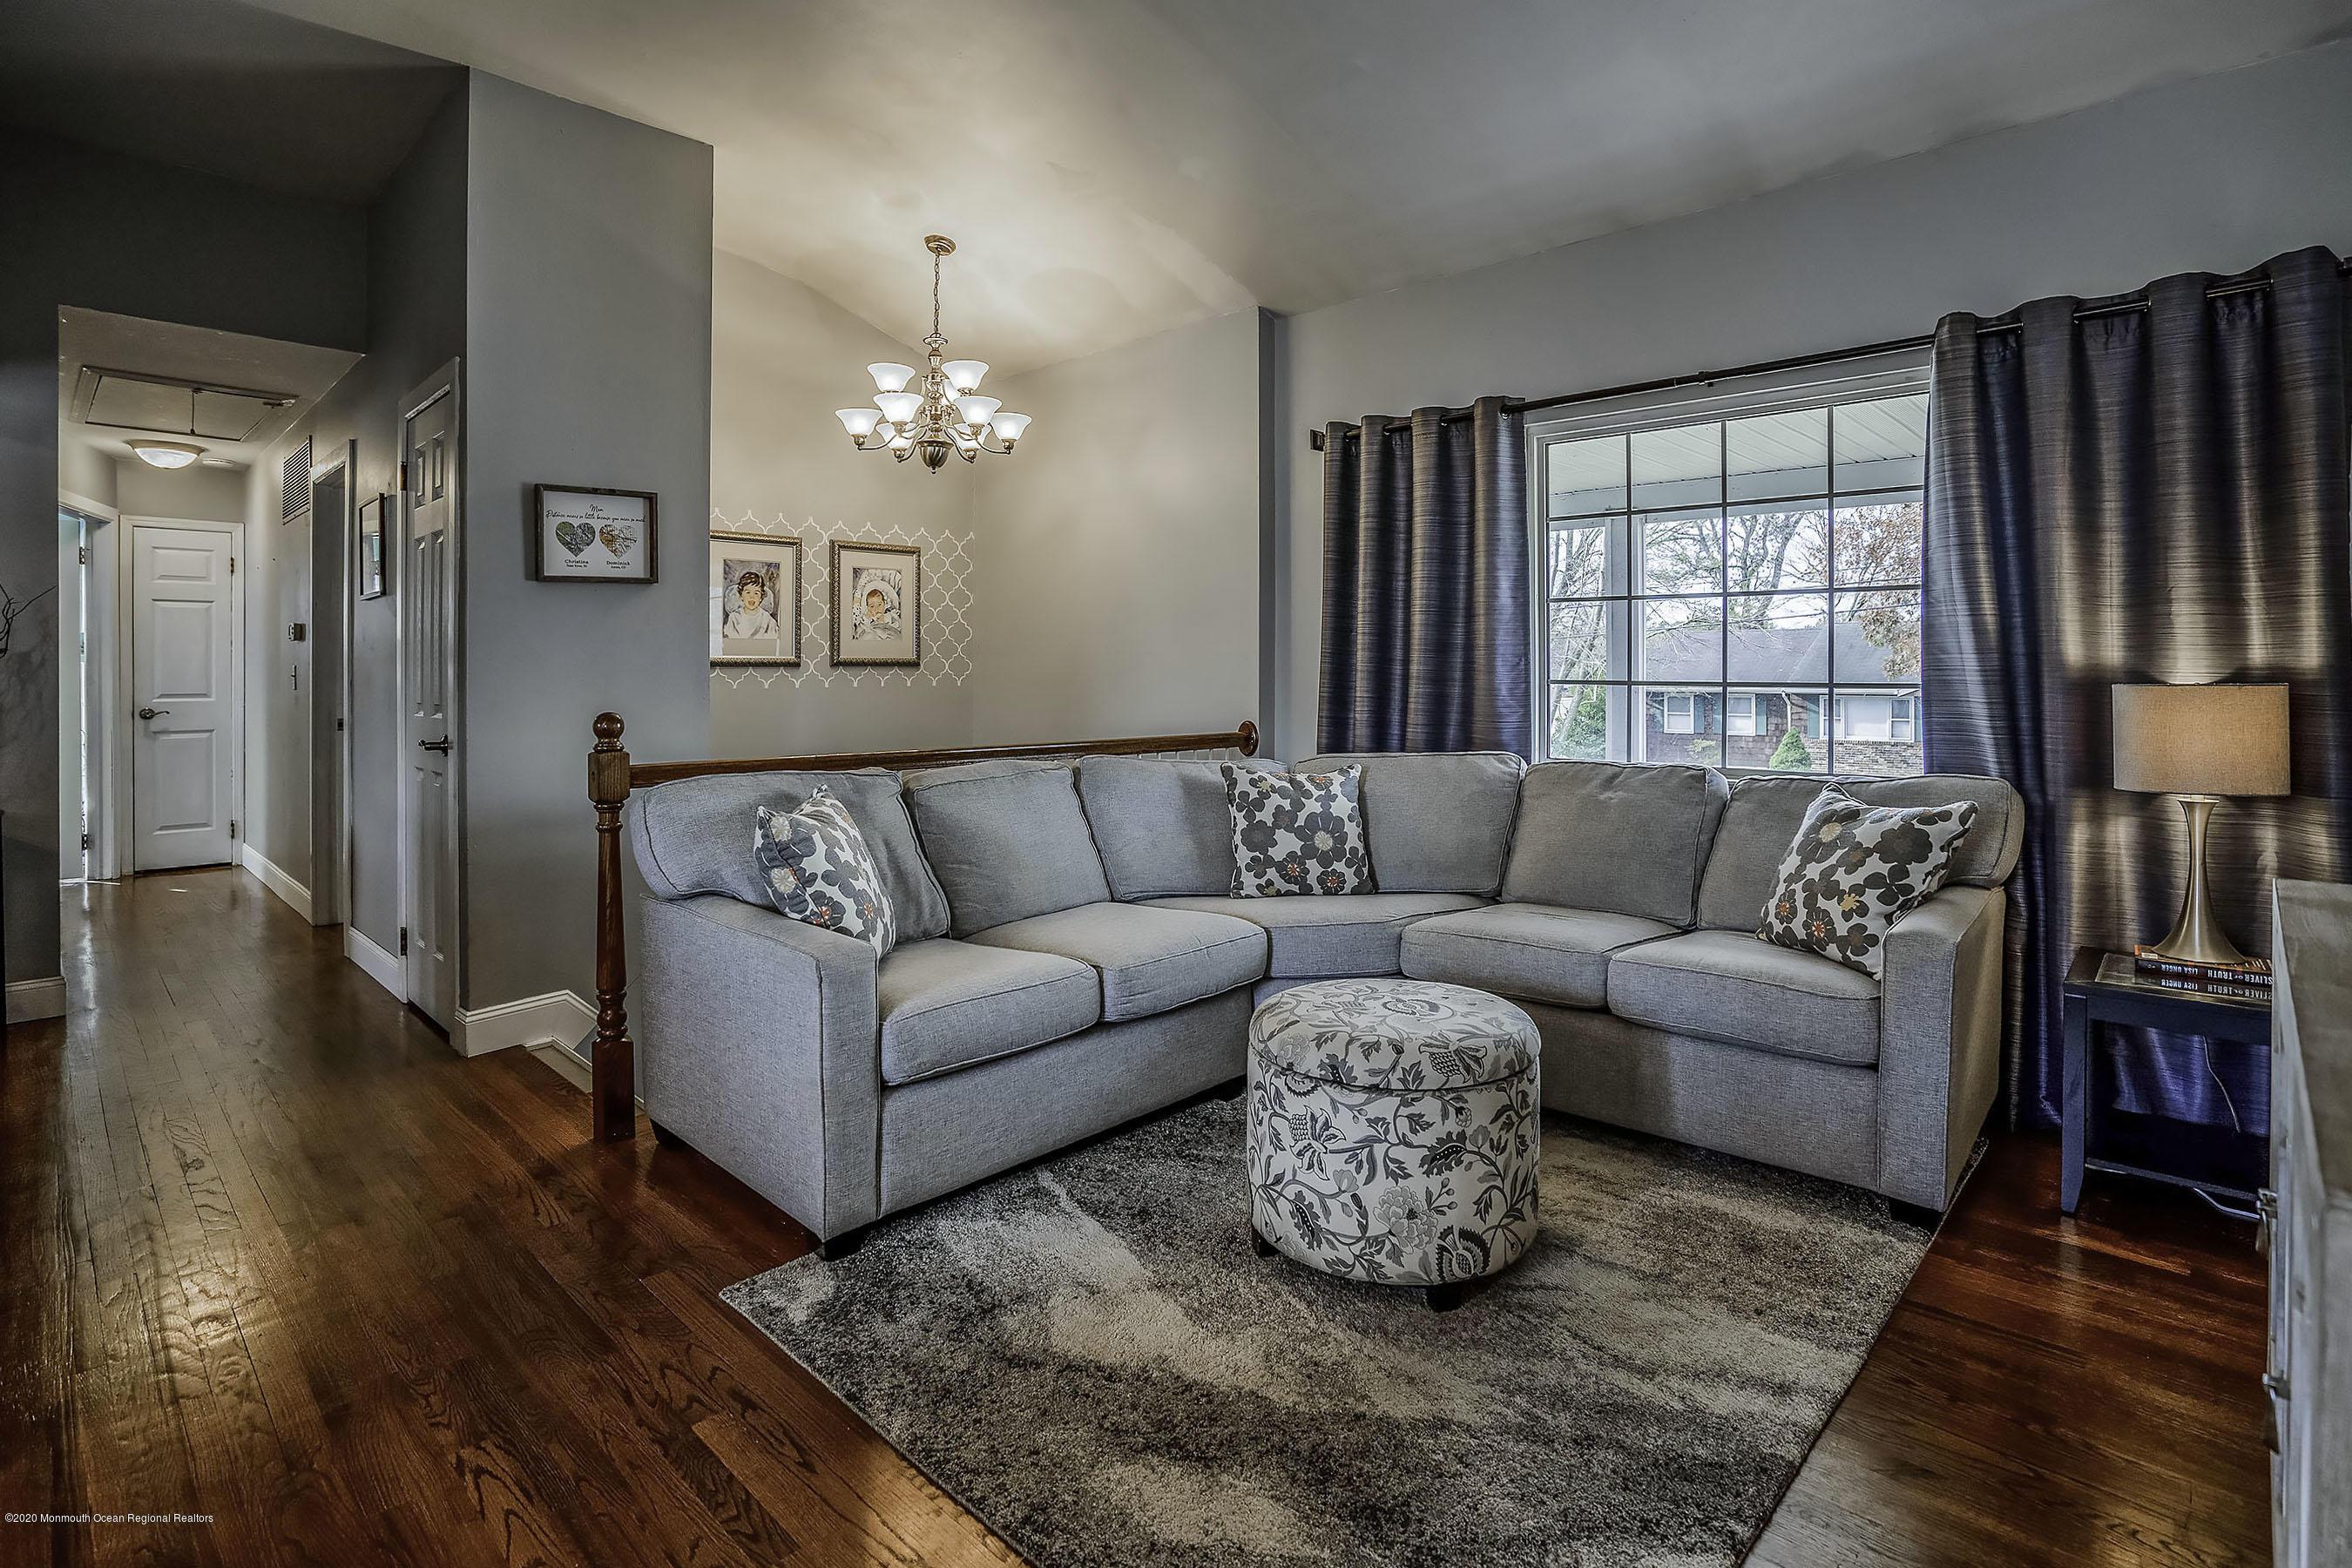 1153 Sylvan Drive, Toms River, New Jersey 08753, 4 Bedrooms Bedrooms, ,2 BathroomsBathrooms,Single Family,For Sale,1153 Sylvan Drive,2,22041229